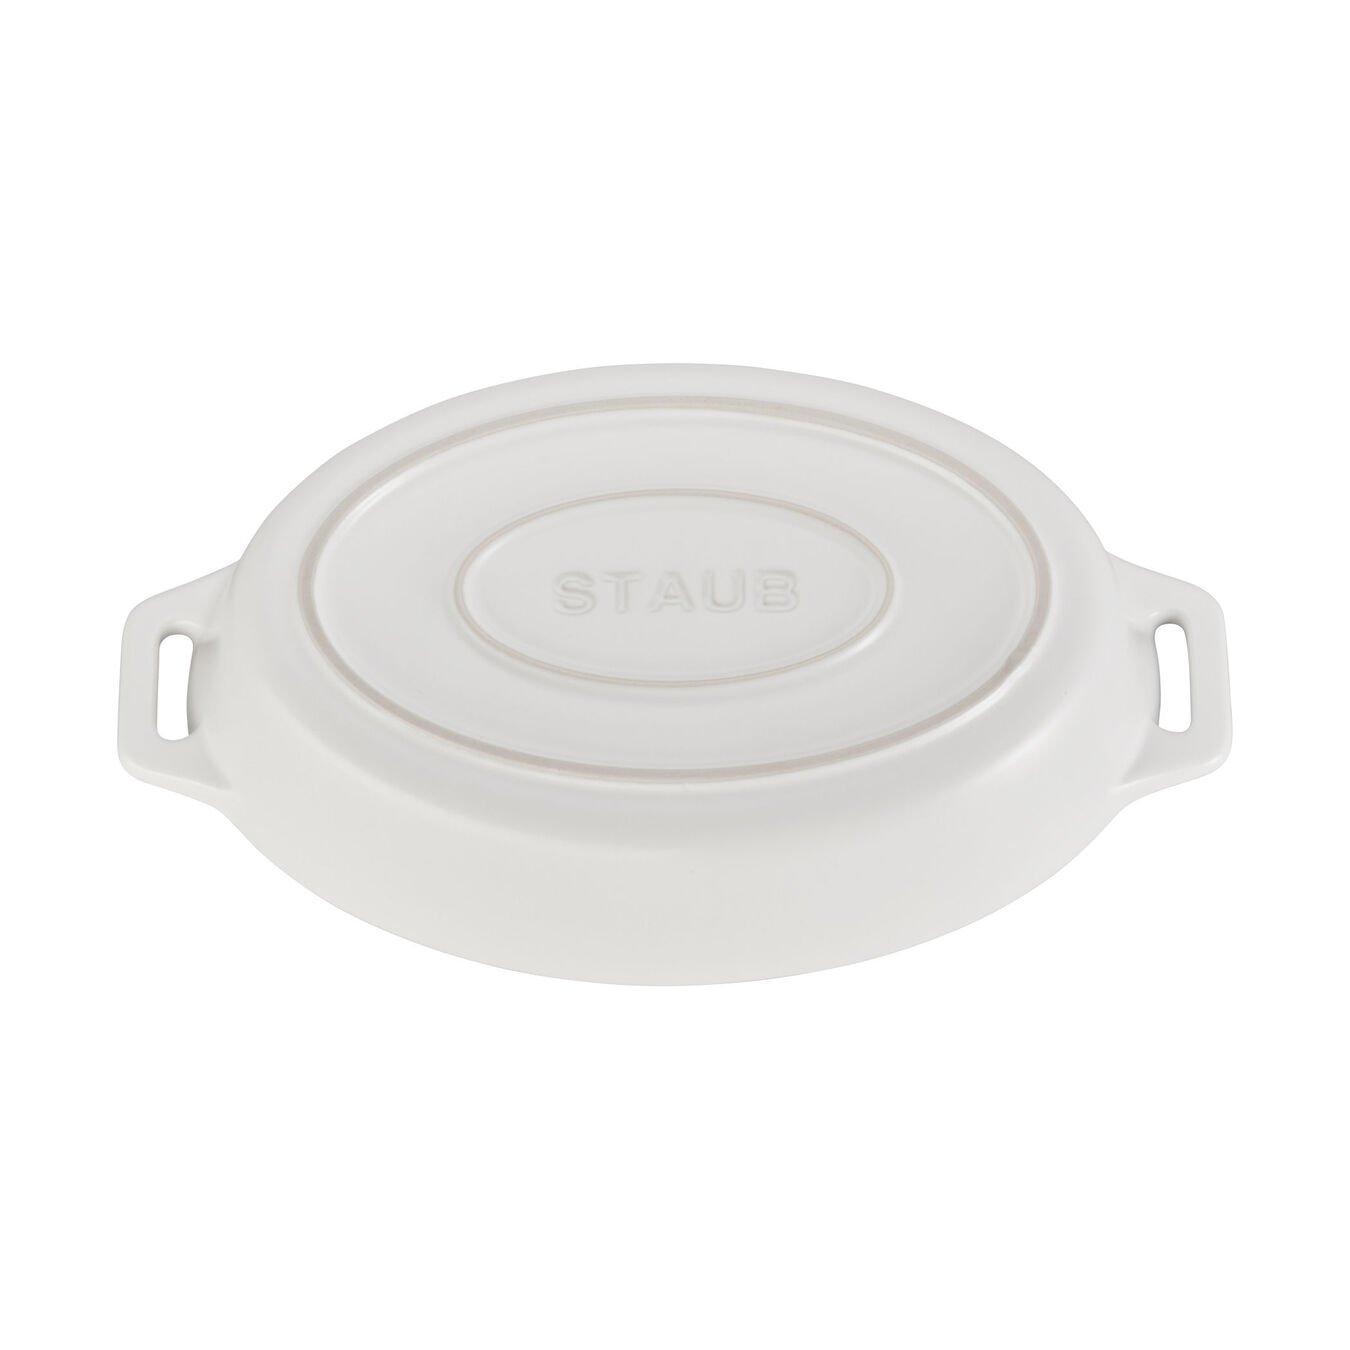 9-inch Oval Baking Dish - Matte White,,large 3